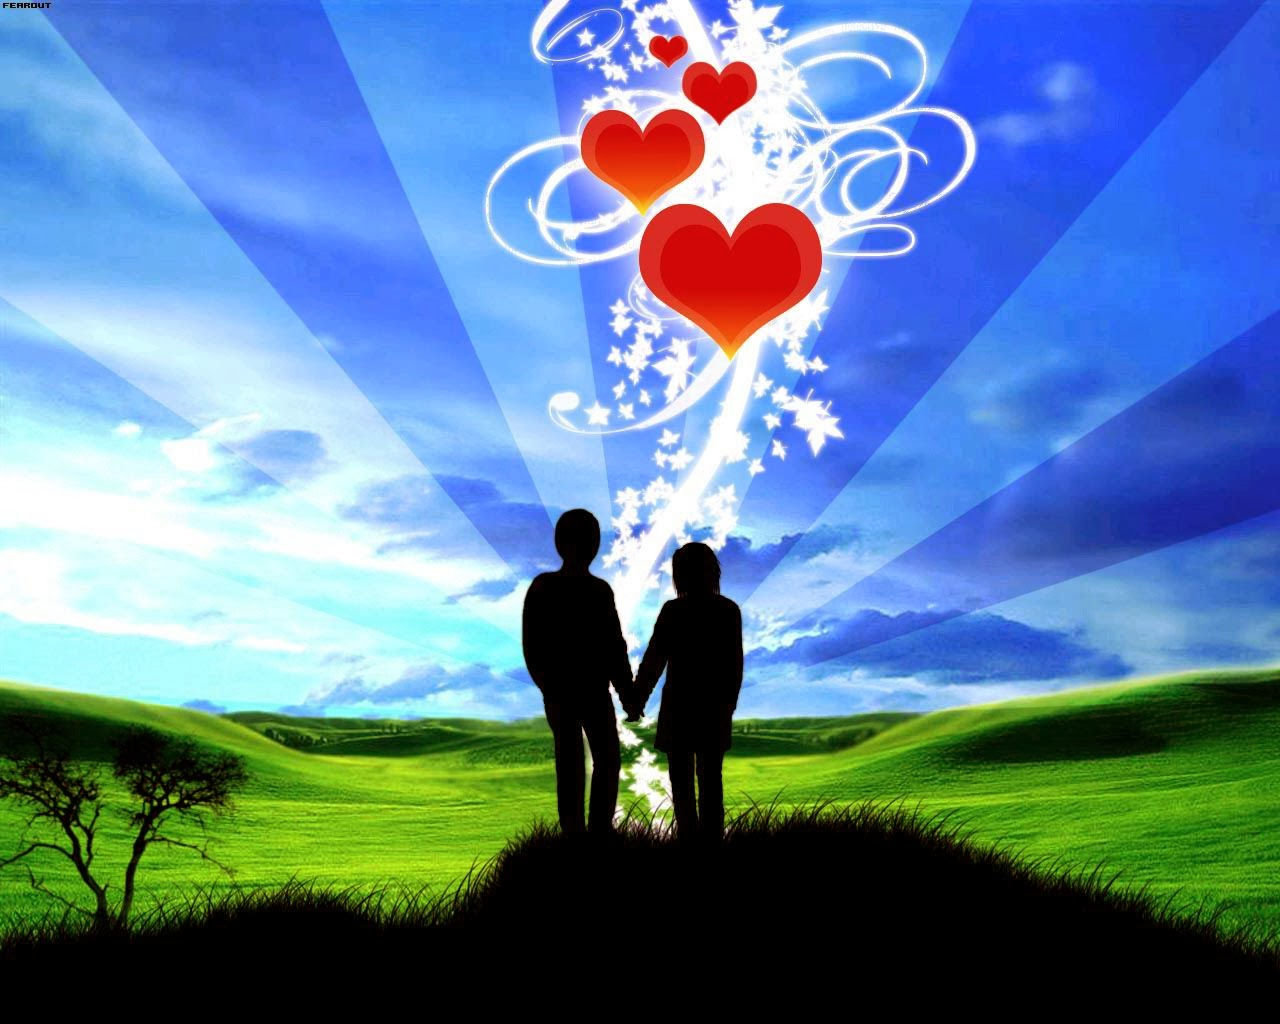 GAMBAR KATA VALENTINE ROMANTIS Gambar Berkata